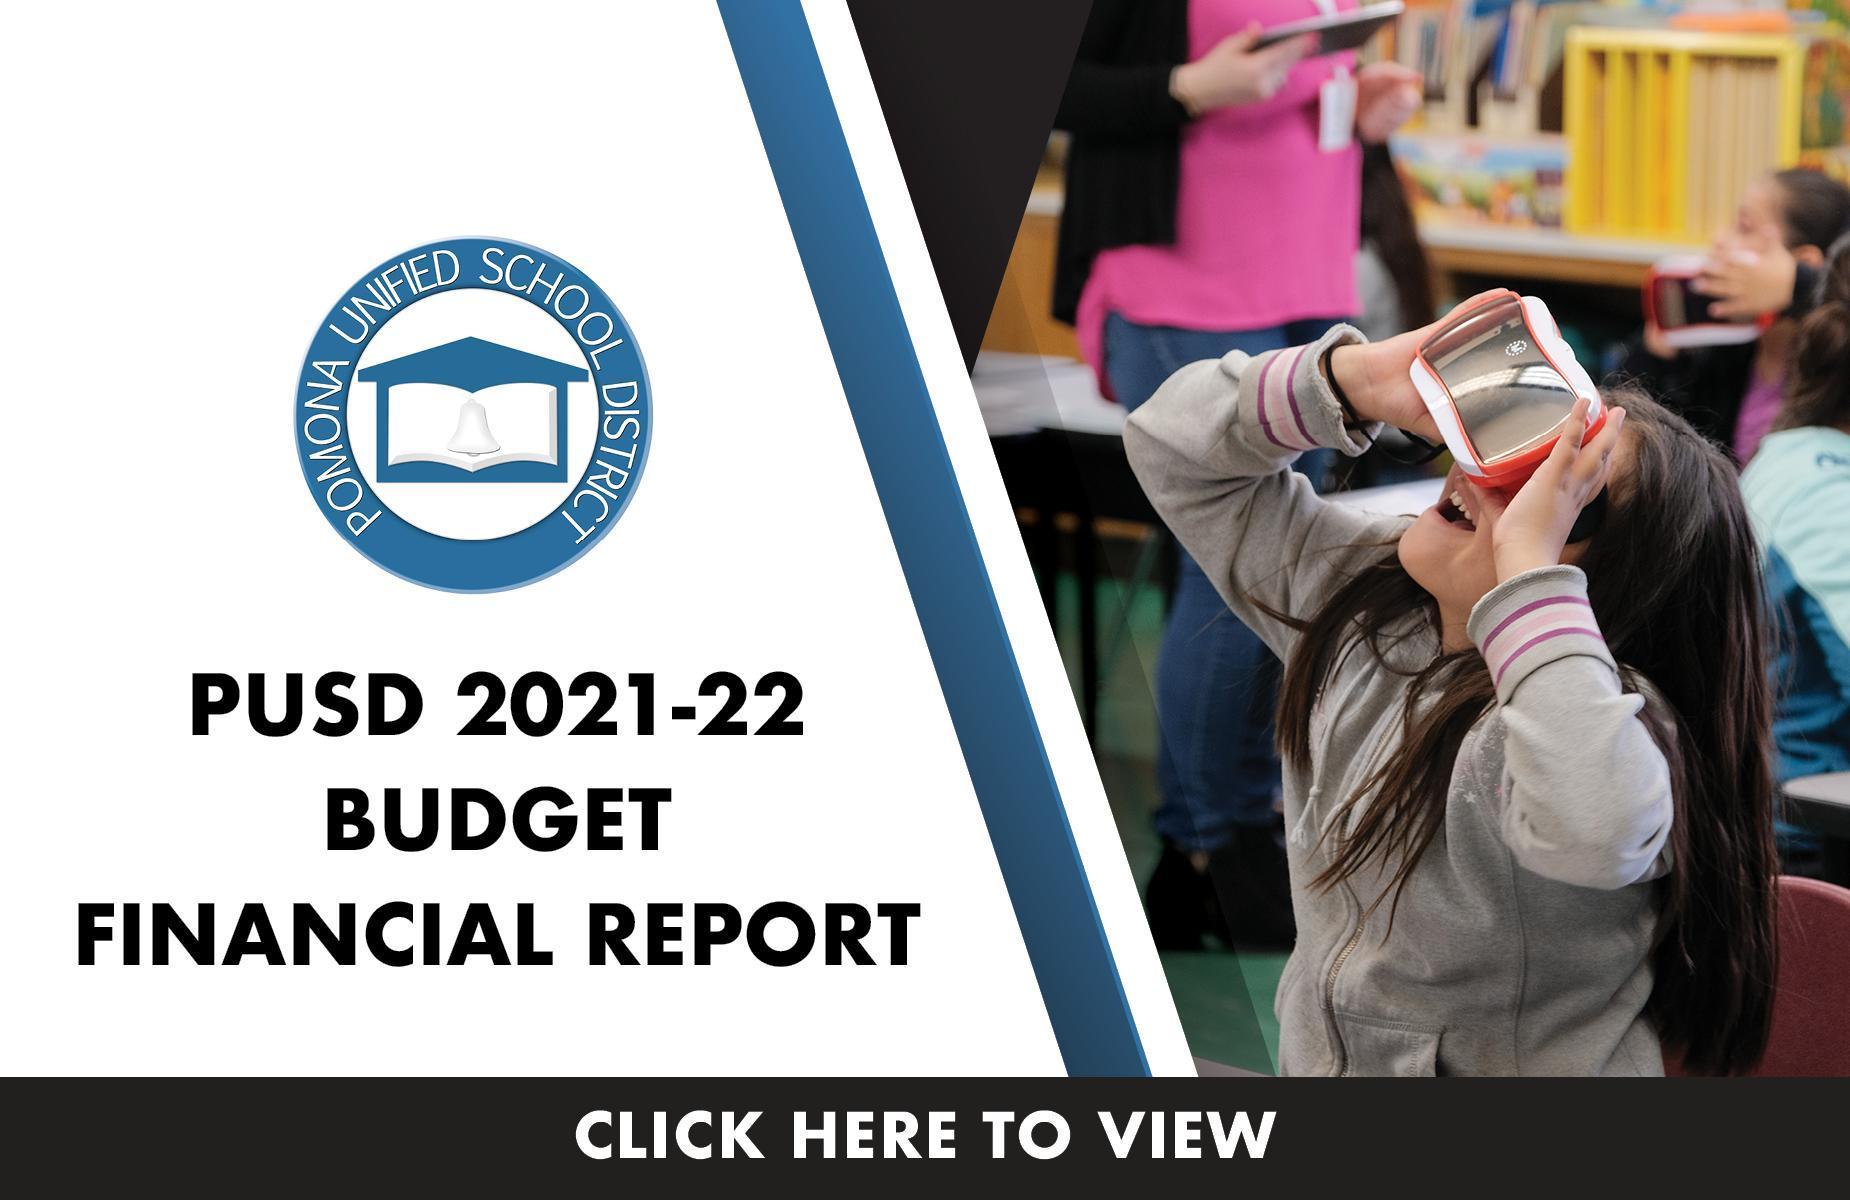 2021-22 Budget Financial Report